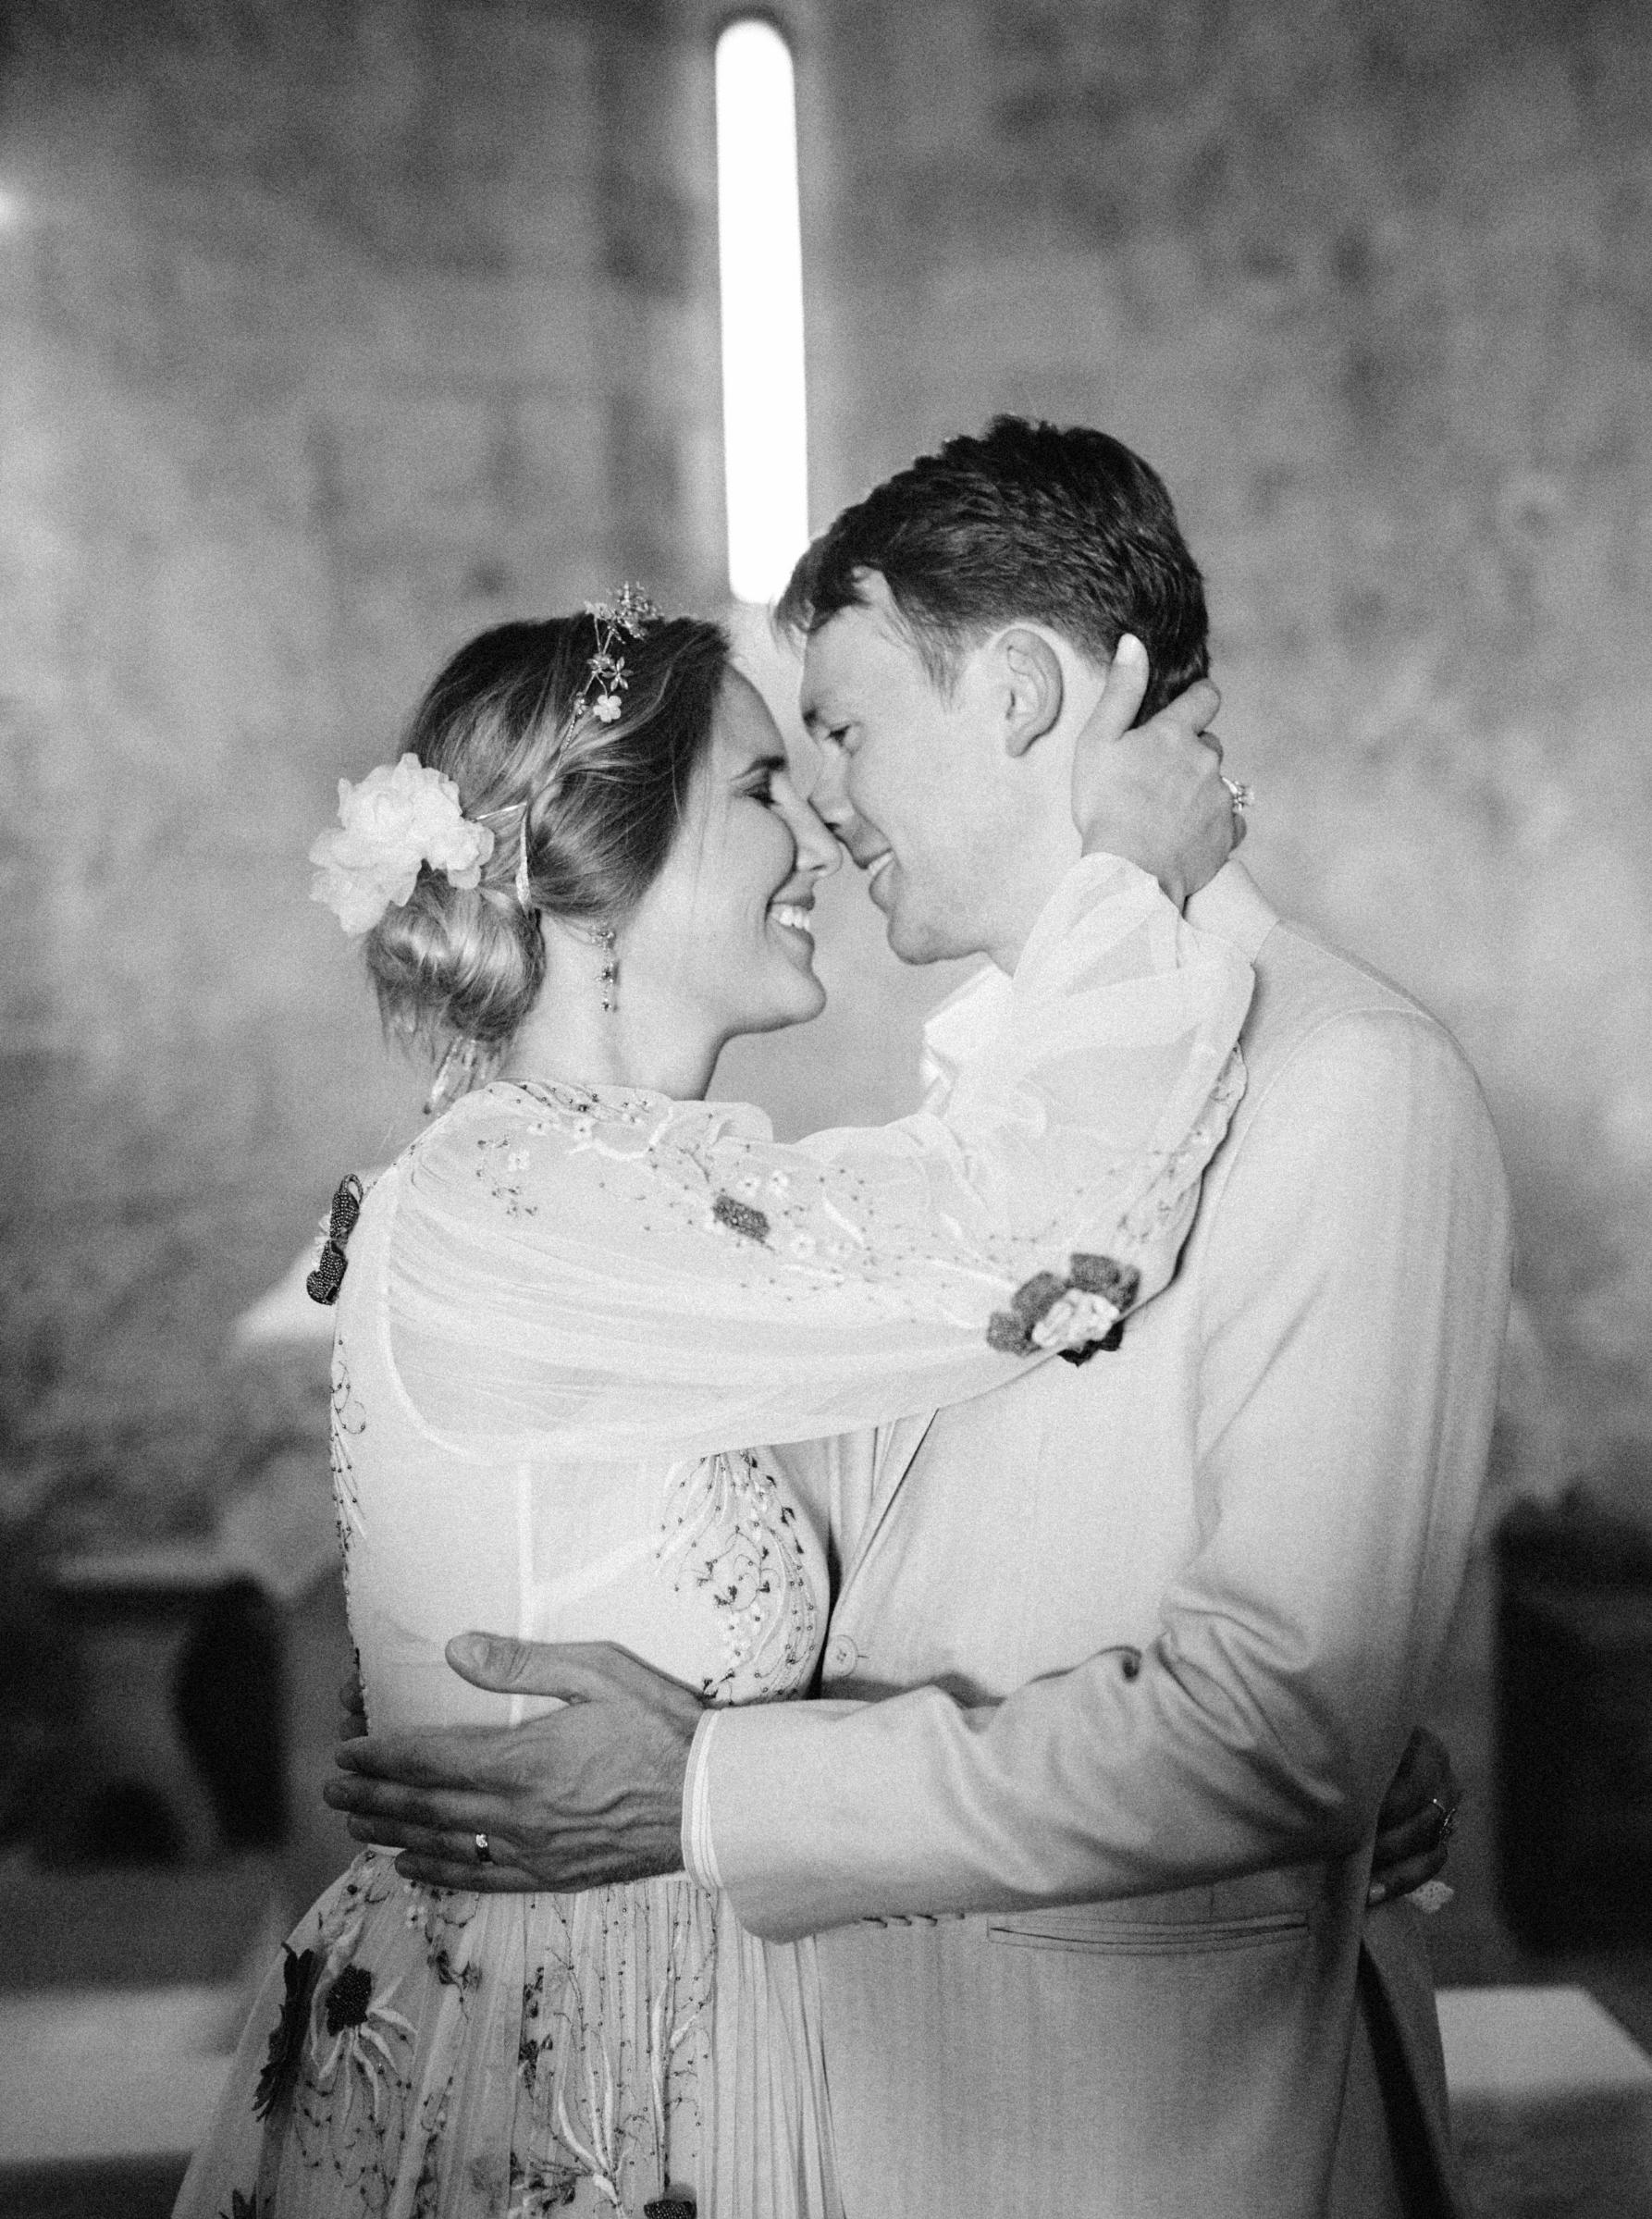 Kyle John l Fine Art Wedding Photography l Chicago, Copenhagen, California, New York, Destination l Blog l Alexis and Zach_Borgo Santo Pietro_Italy_Tuscany_43